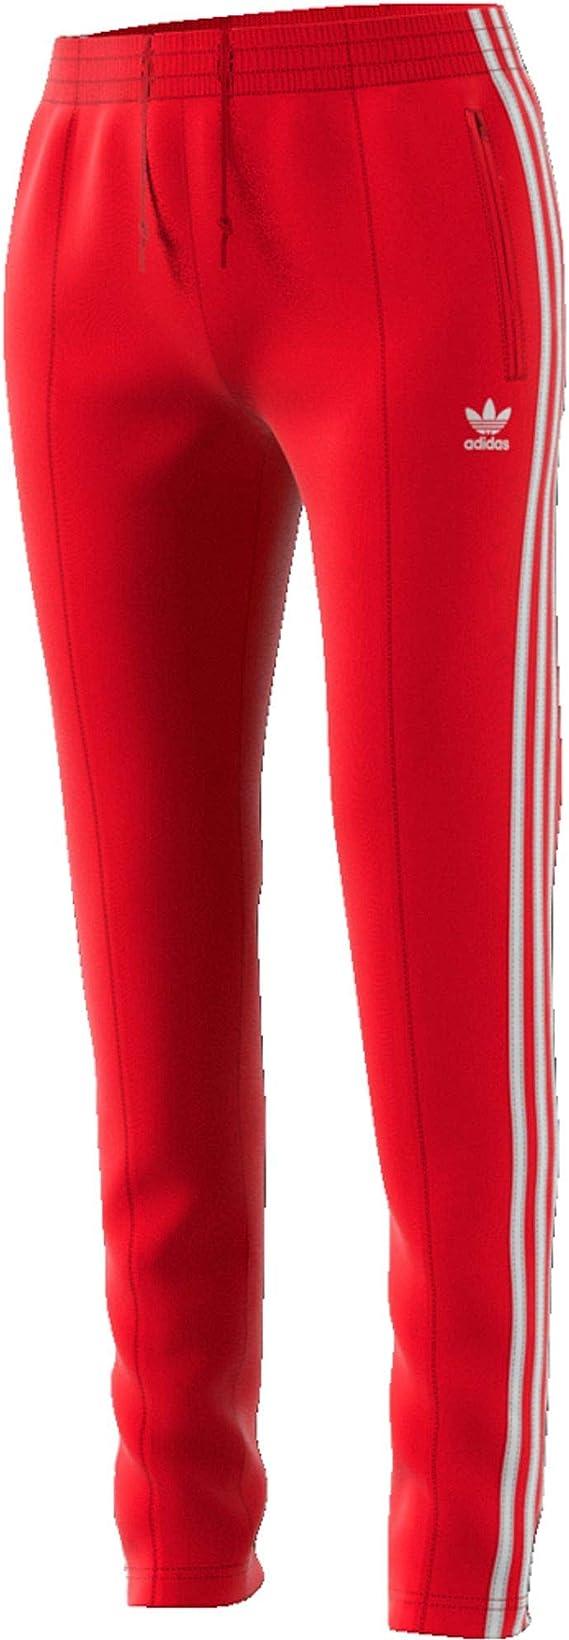 adidas Superstar Tp Pantalon Femme Rouge